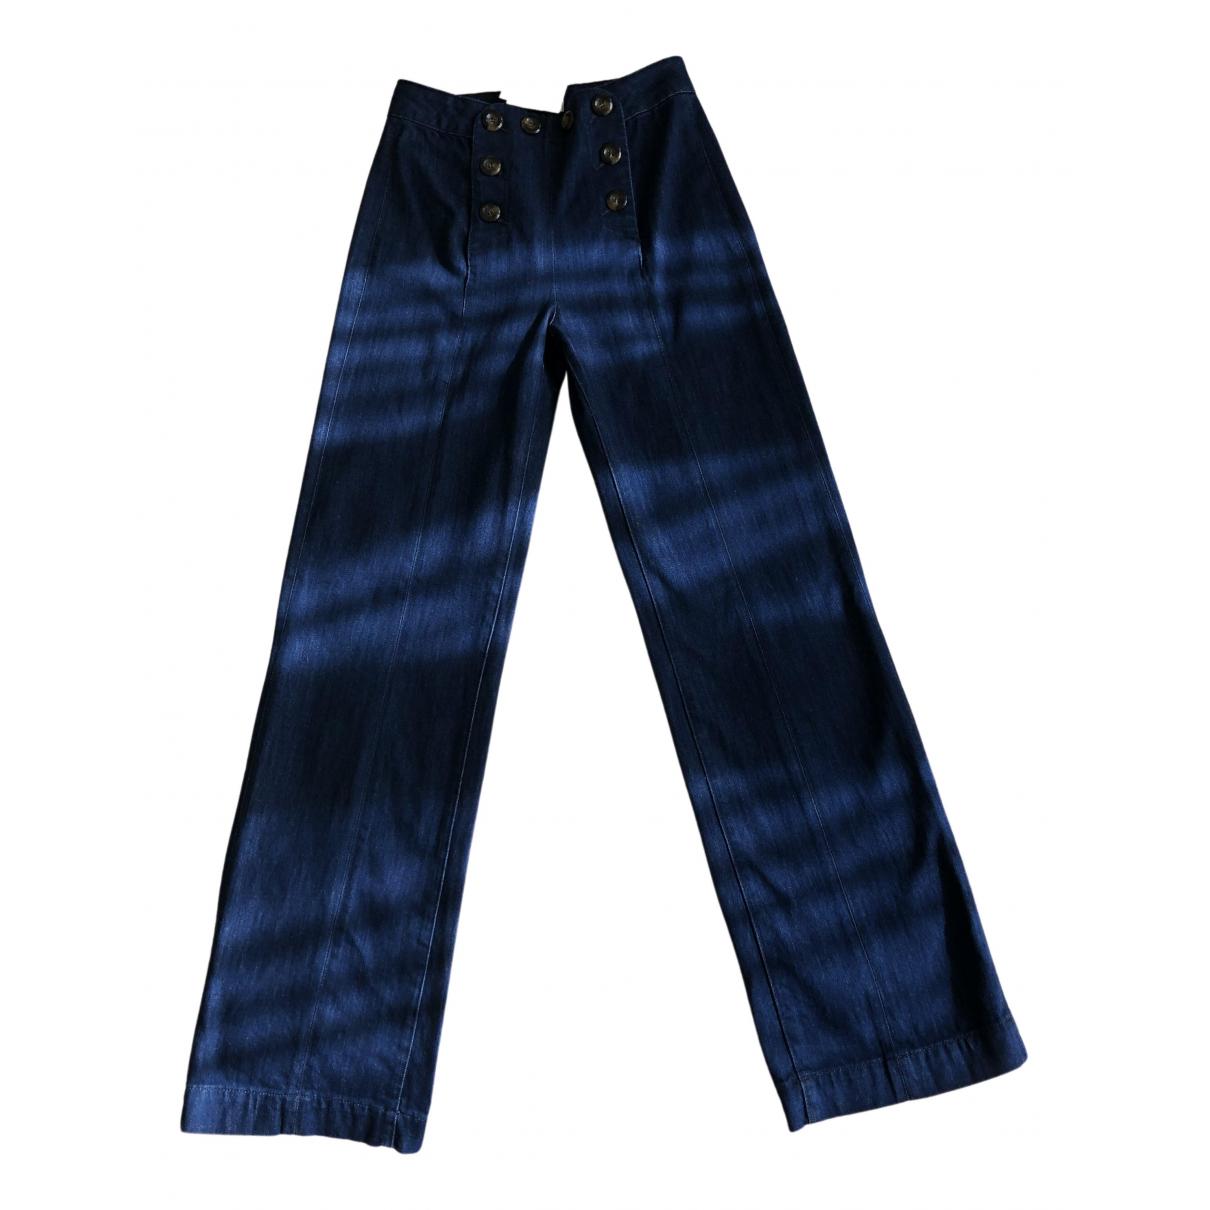 Sézane Fall Winter 2019 Blue Cotton Jeans for Women 36 FR